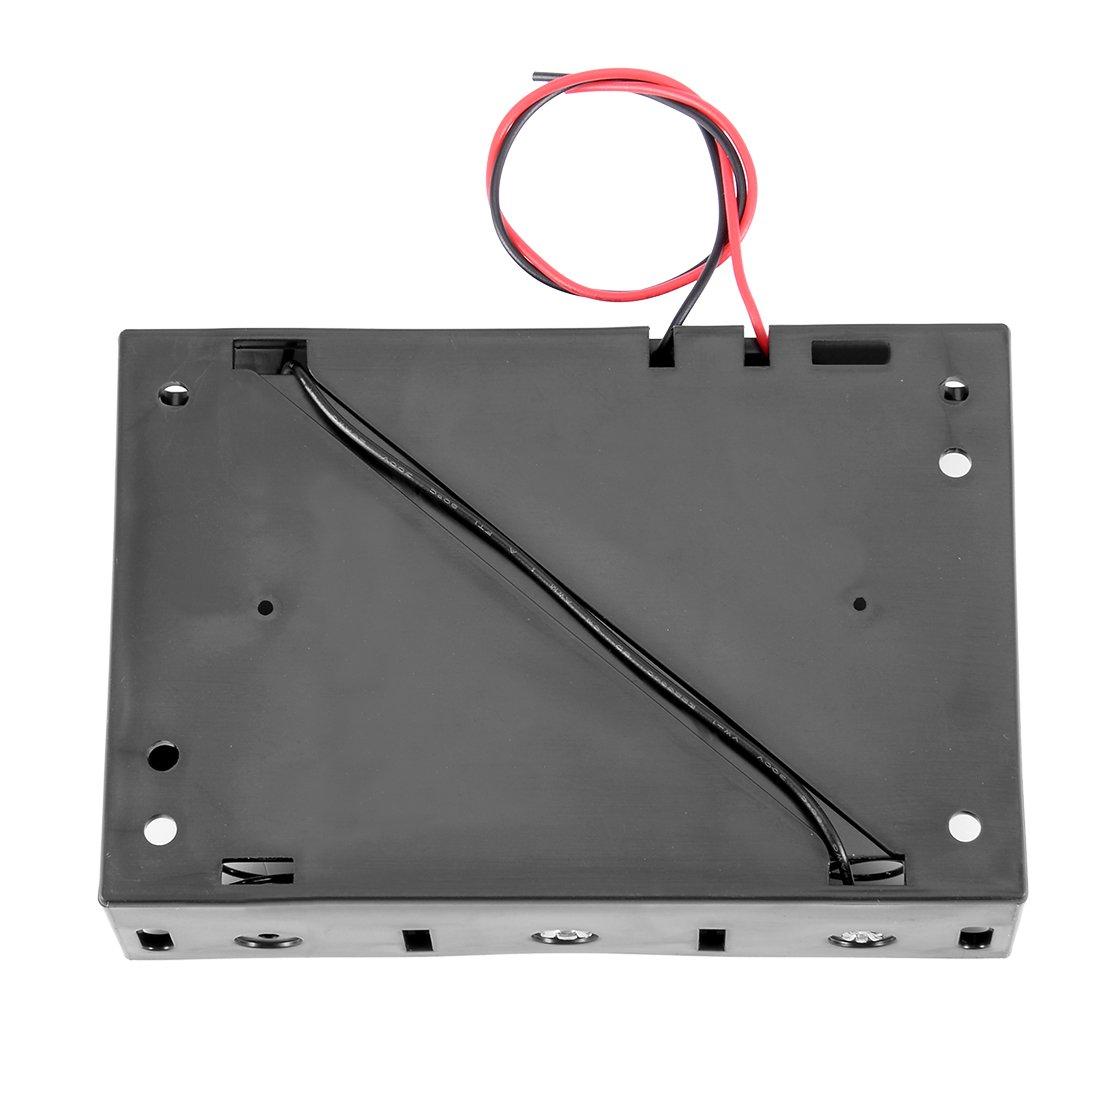 uxcell 4.5V Battery Holder Case Storage Box 3 x 1.5V D Batteries Wire Leads 20Pcs